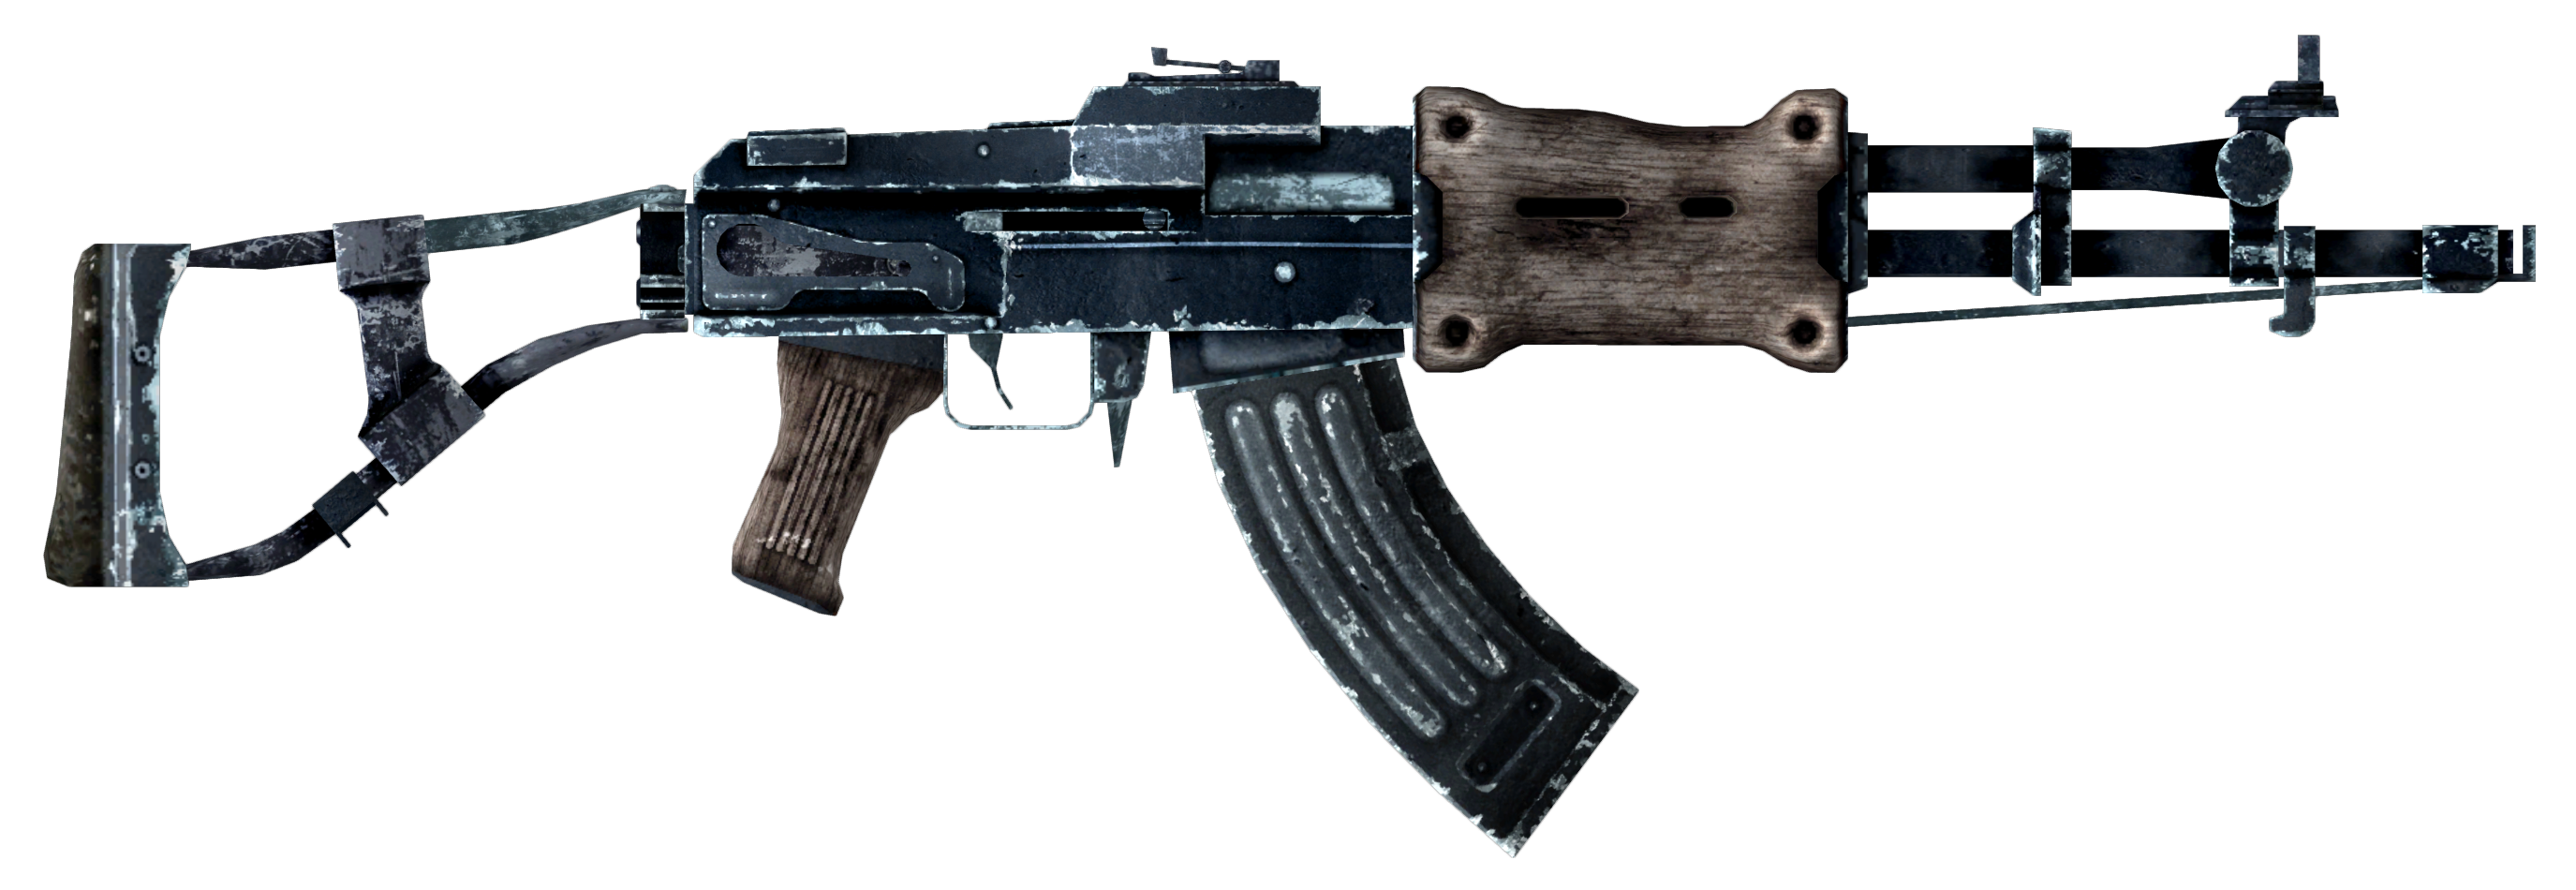 Big Guns PNG - 158441